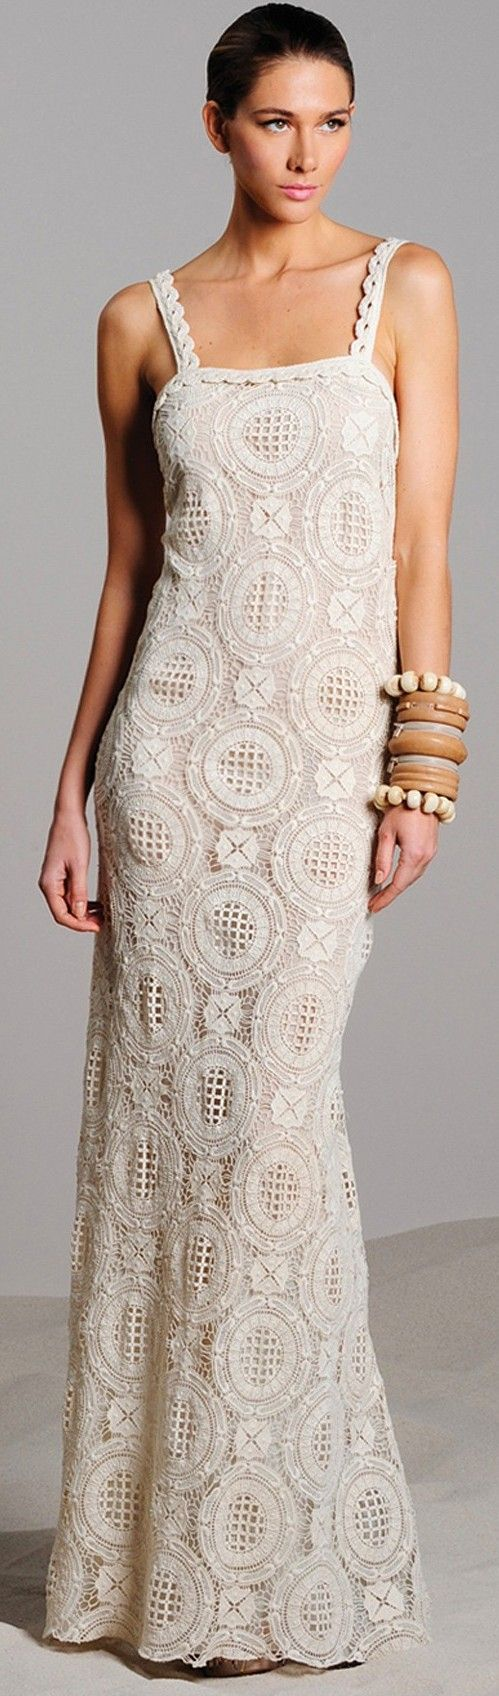 ALEXIS Brigitta Sleeveless Crochet Dress ♥✤   Keep the Glamour   BeStayBeautiful